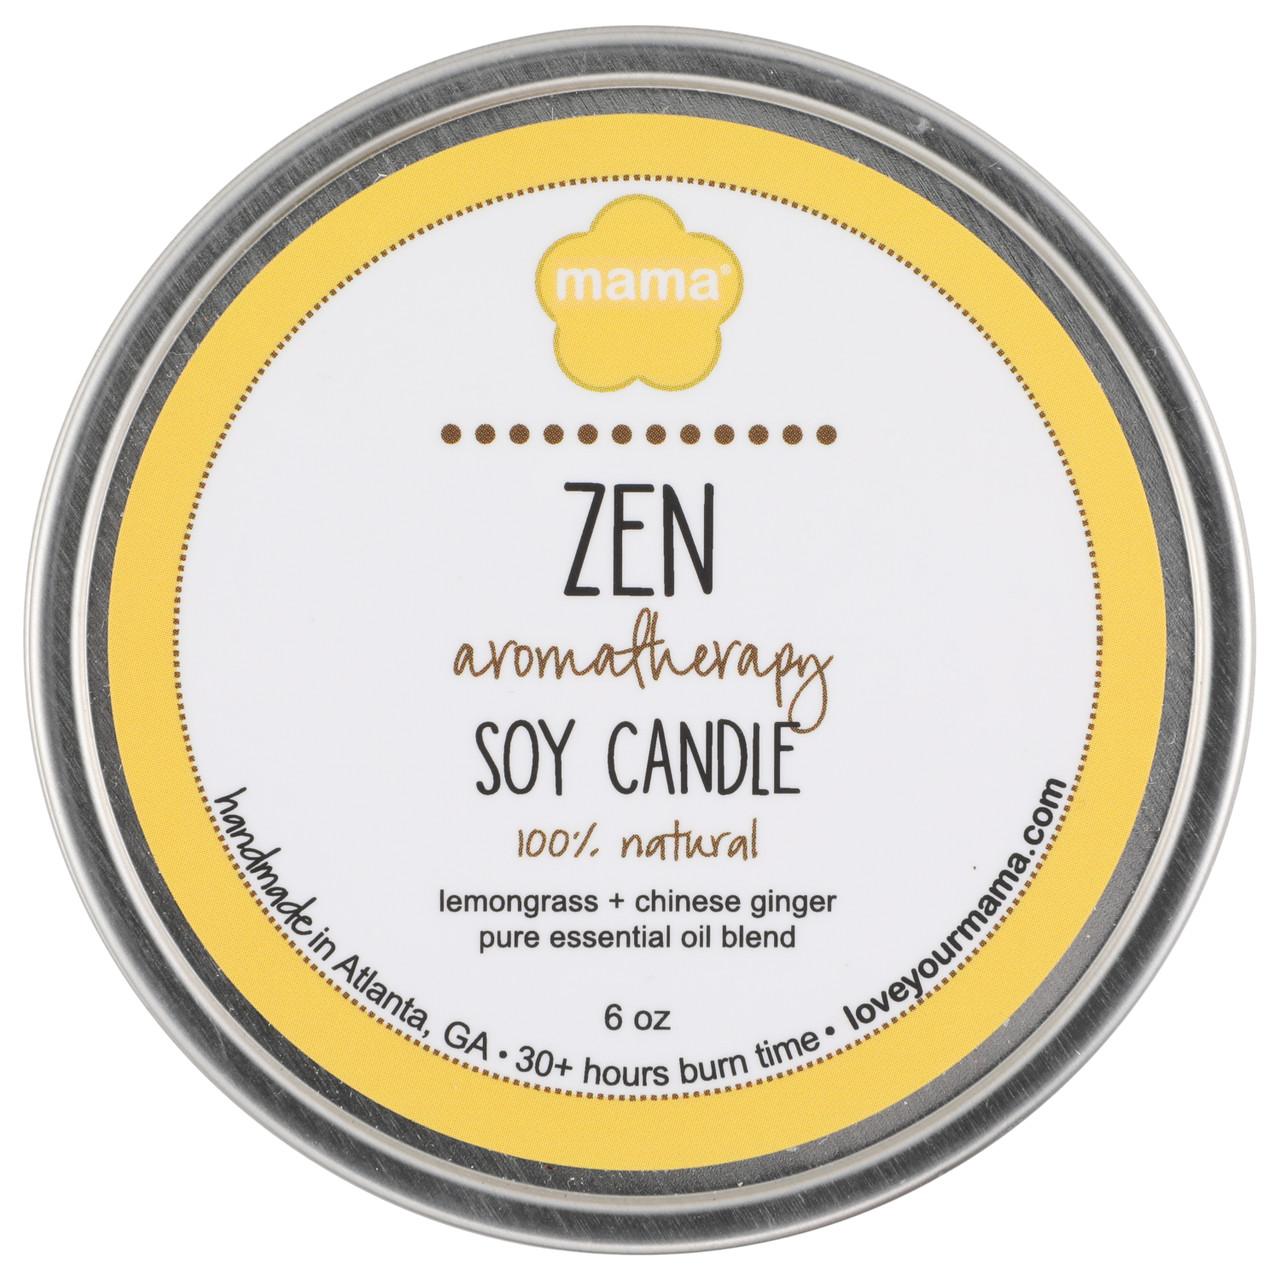 Lemongrass + Ginger (Zen) 6 oz. Soy Candle Tin | Mama Bath + Body